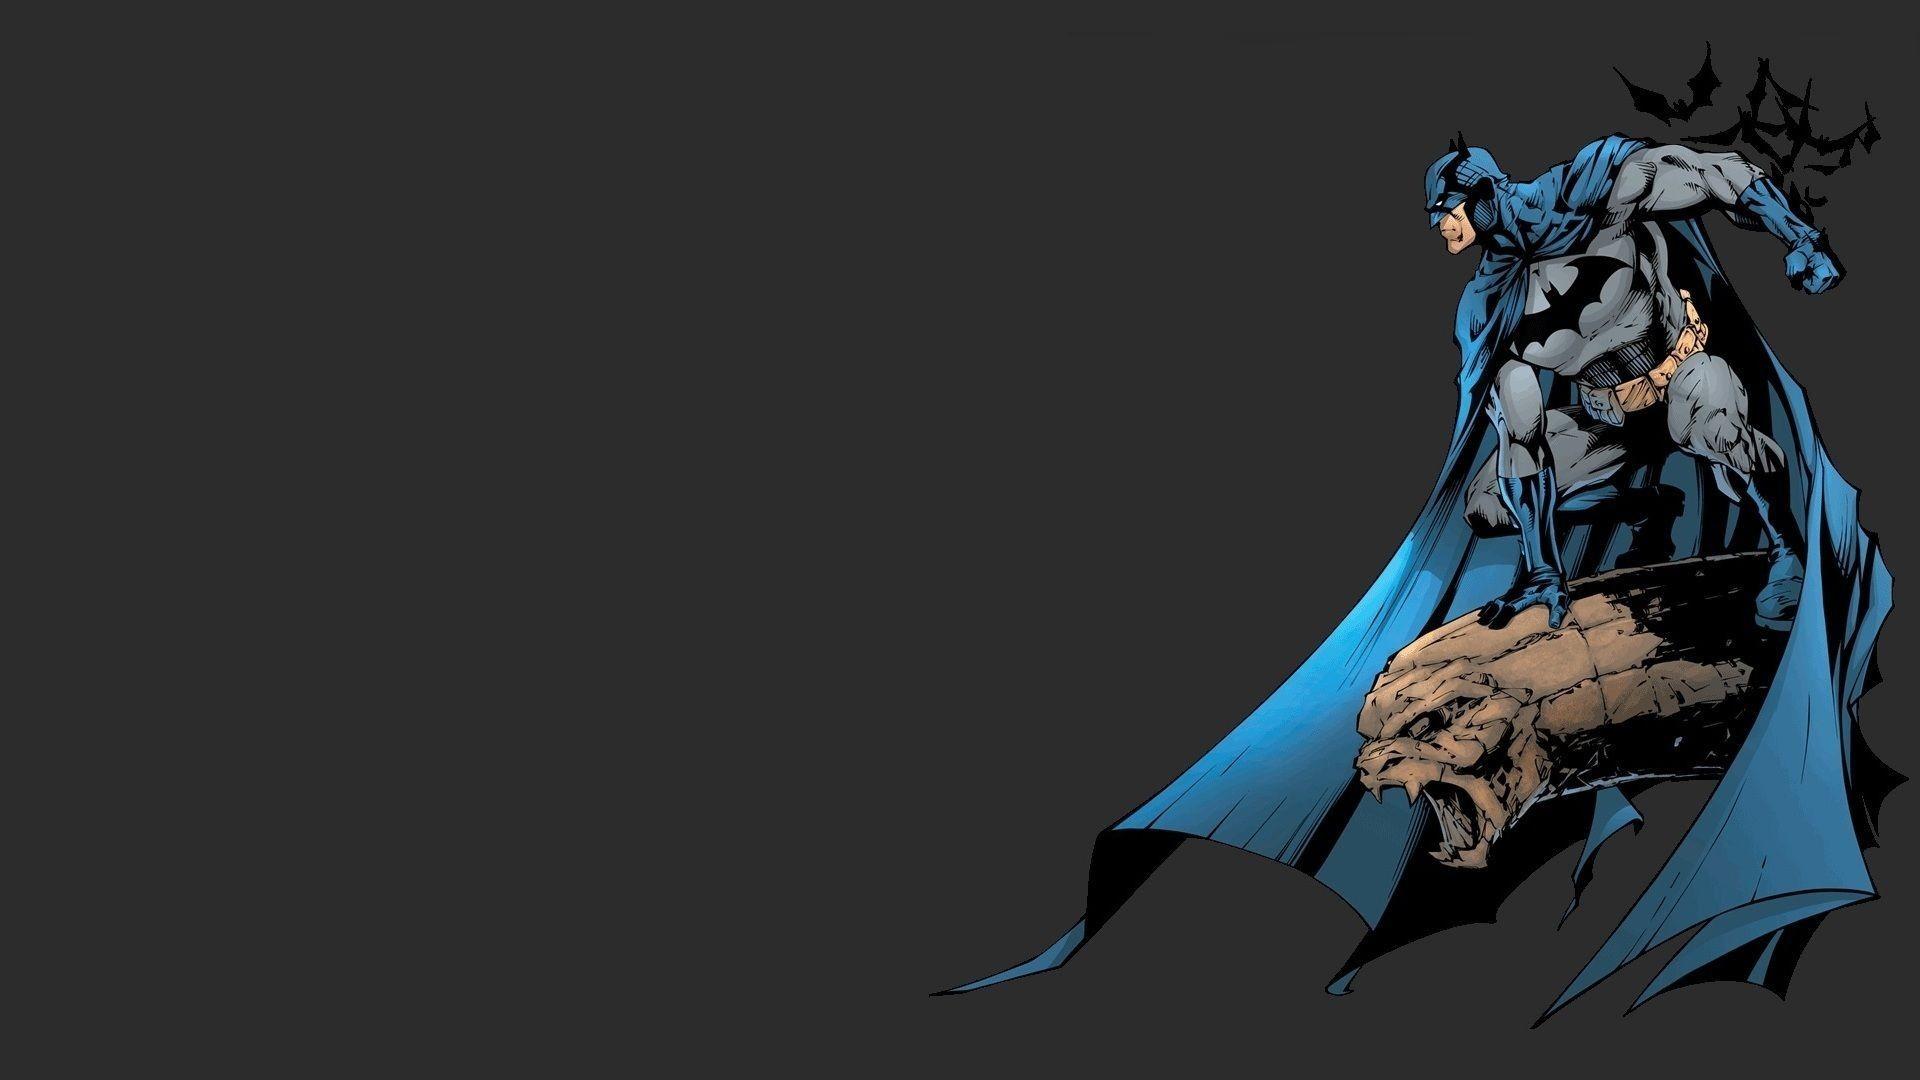 Res: 1920x1080, Batman Wallpapers 1080p ~ Sdeerwallpaper